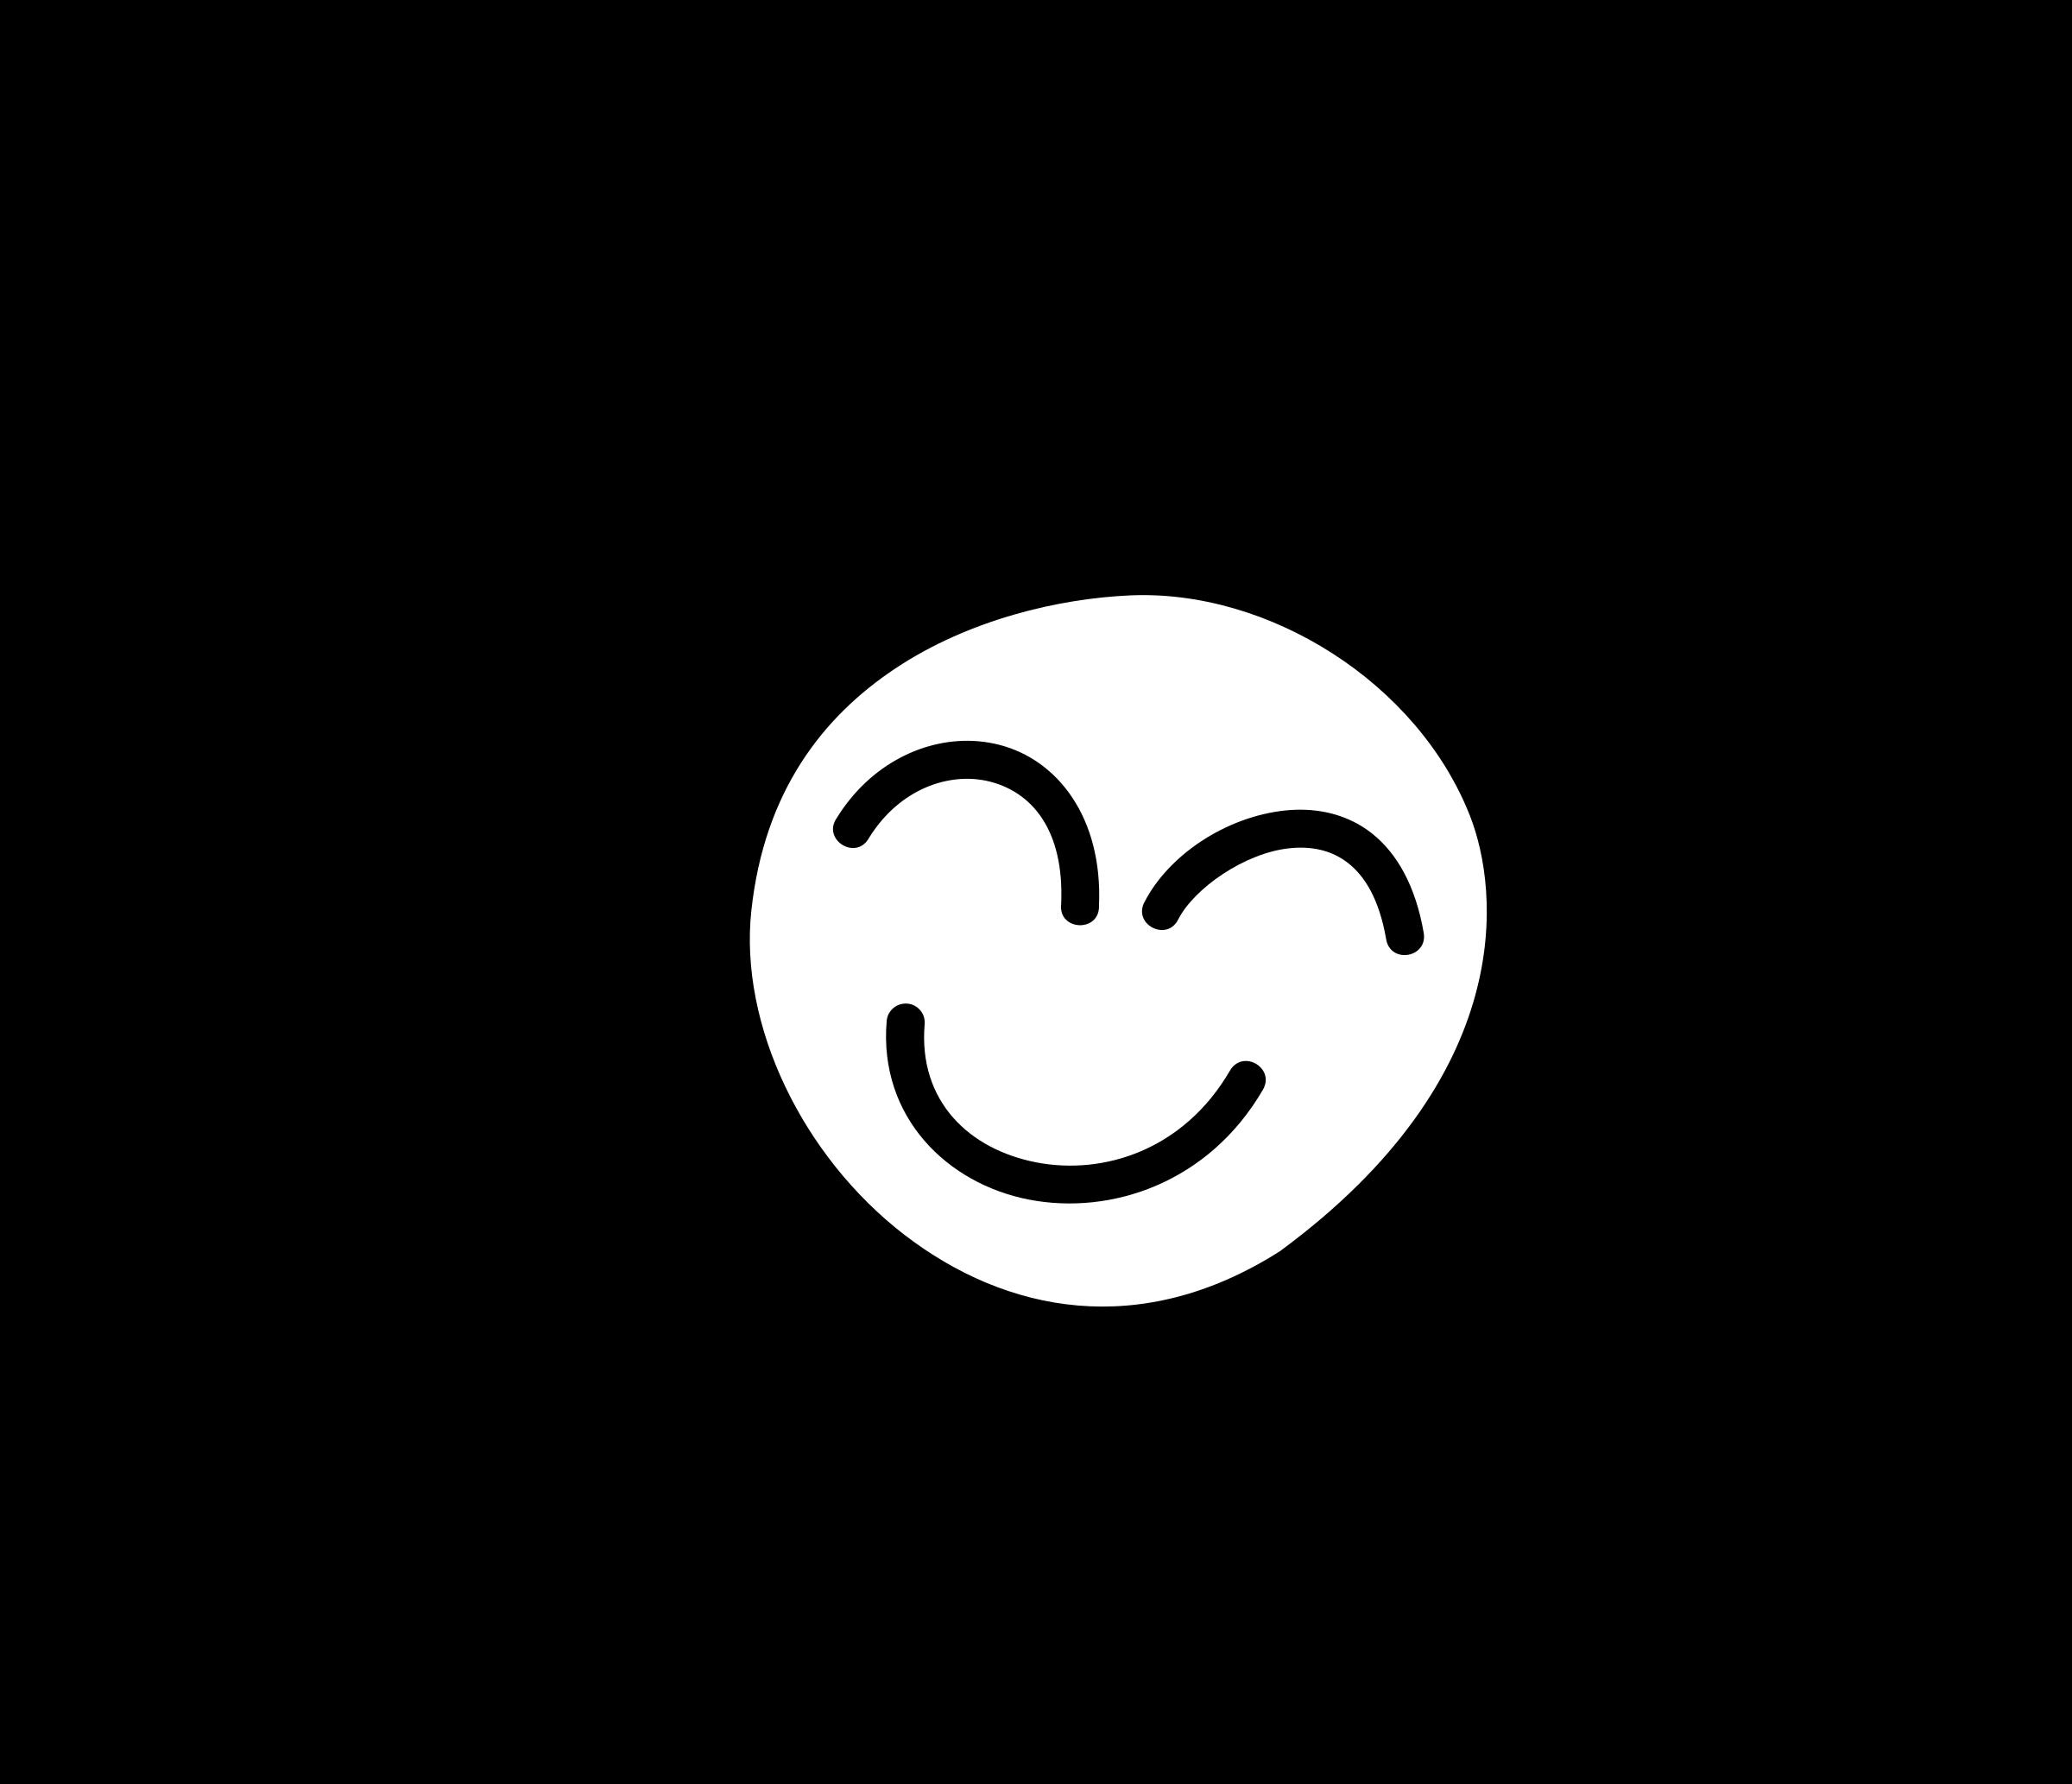 Black Sun PNG - 155164